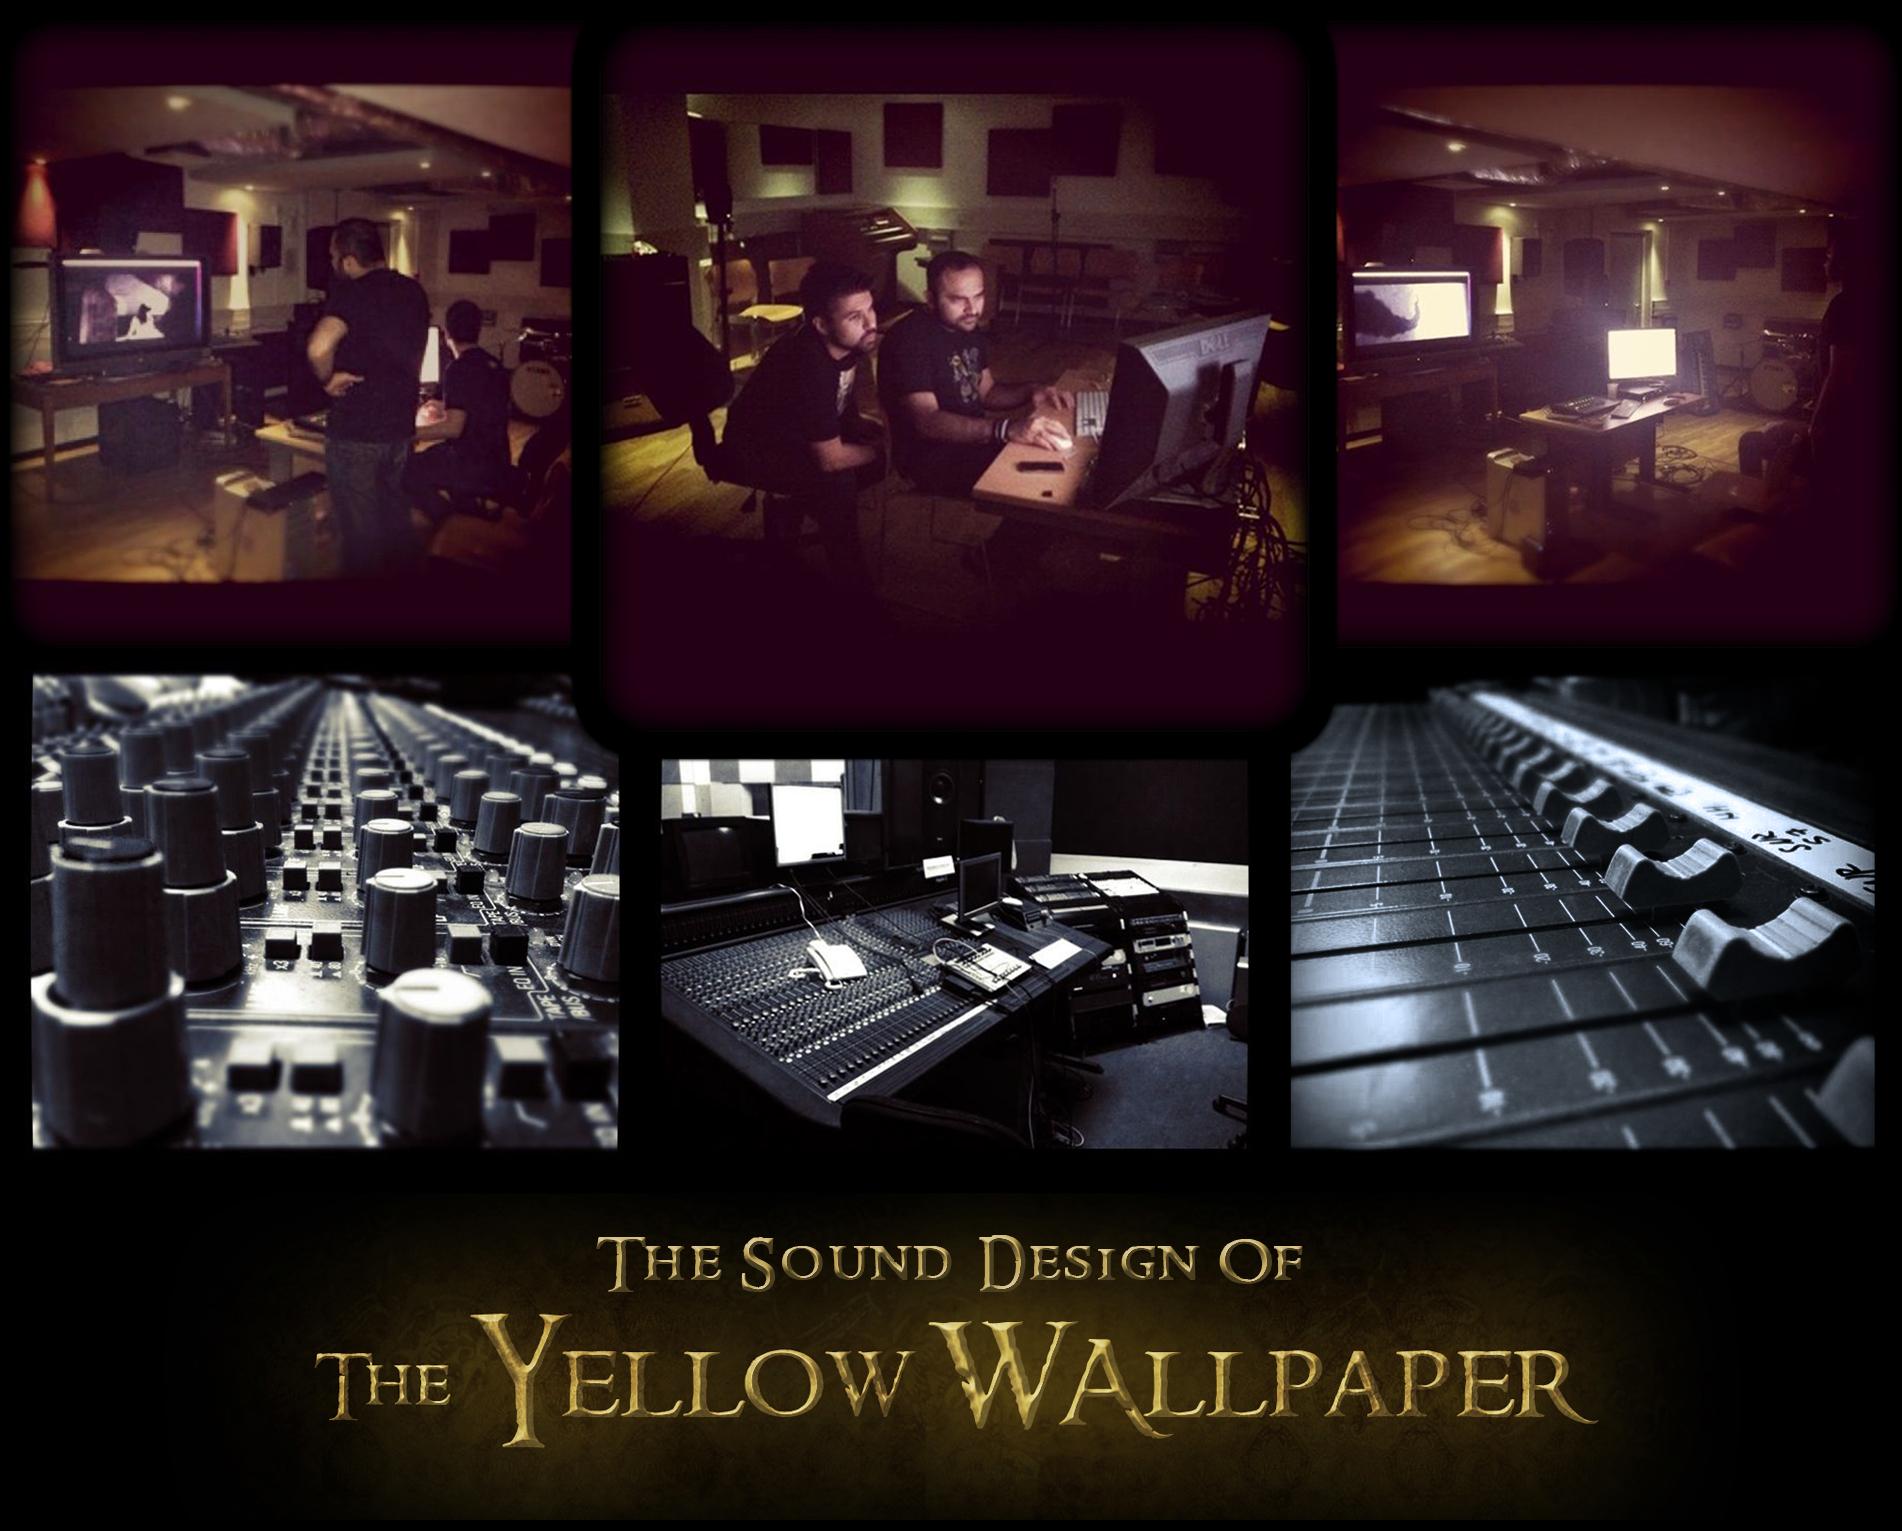 yellowwallpapershortfilm Follow our progress as we near the end of 1902x1531